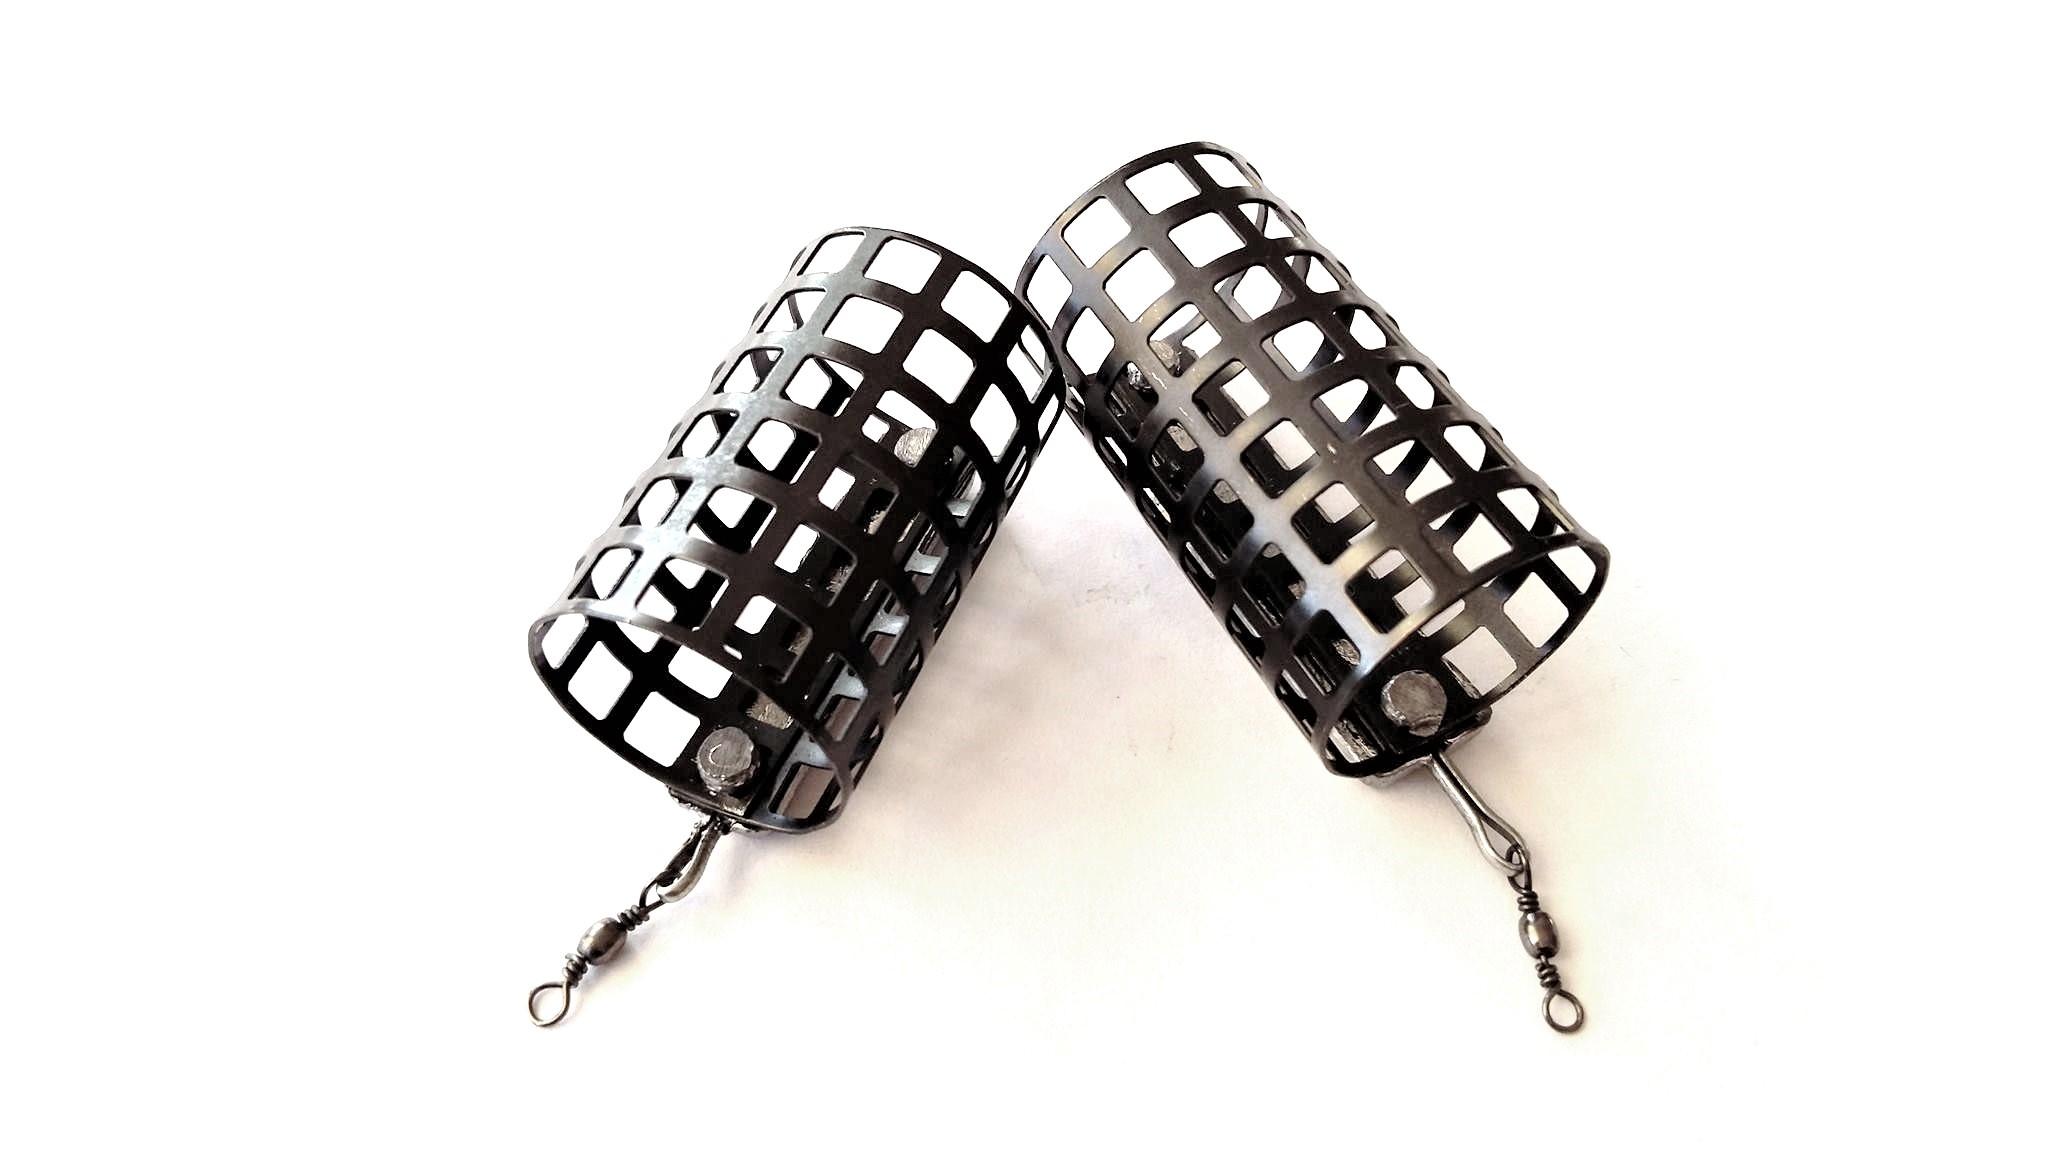 Okrúhle žiarovky Basket bez DNA 50g Hit !!!